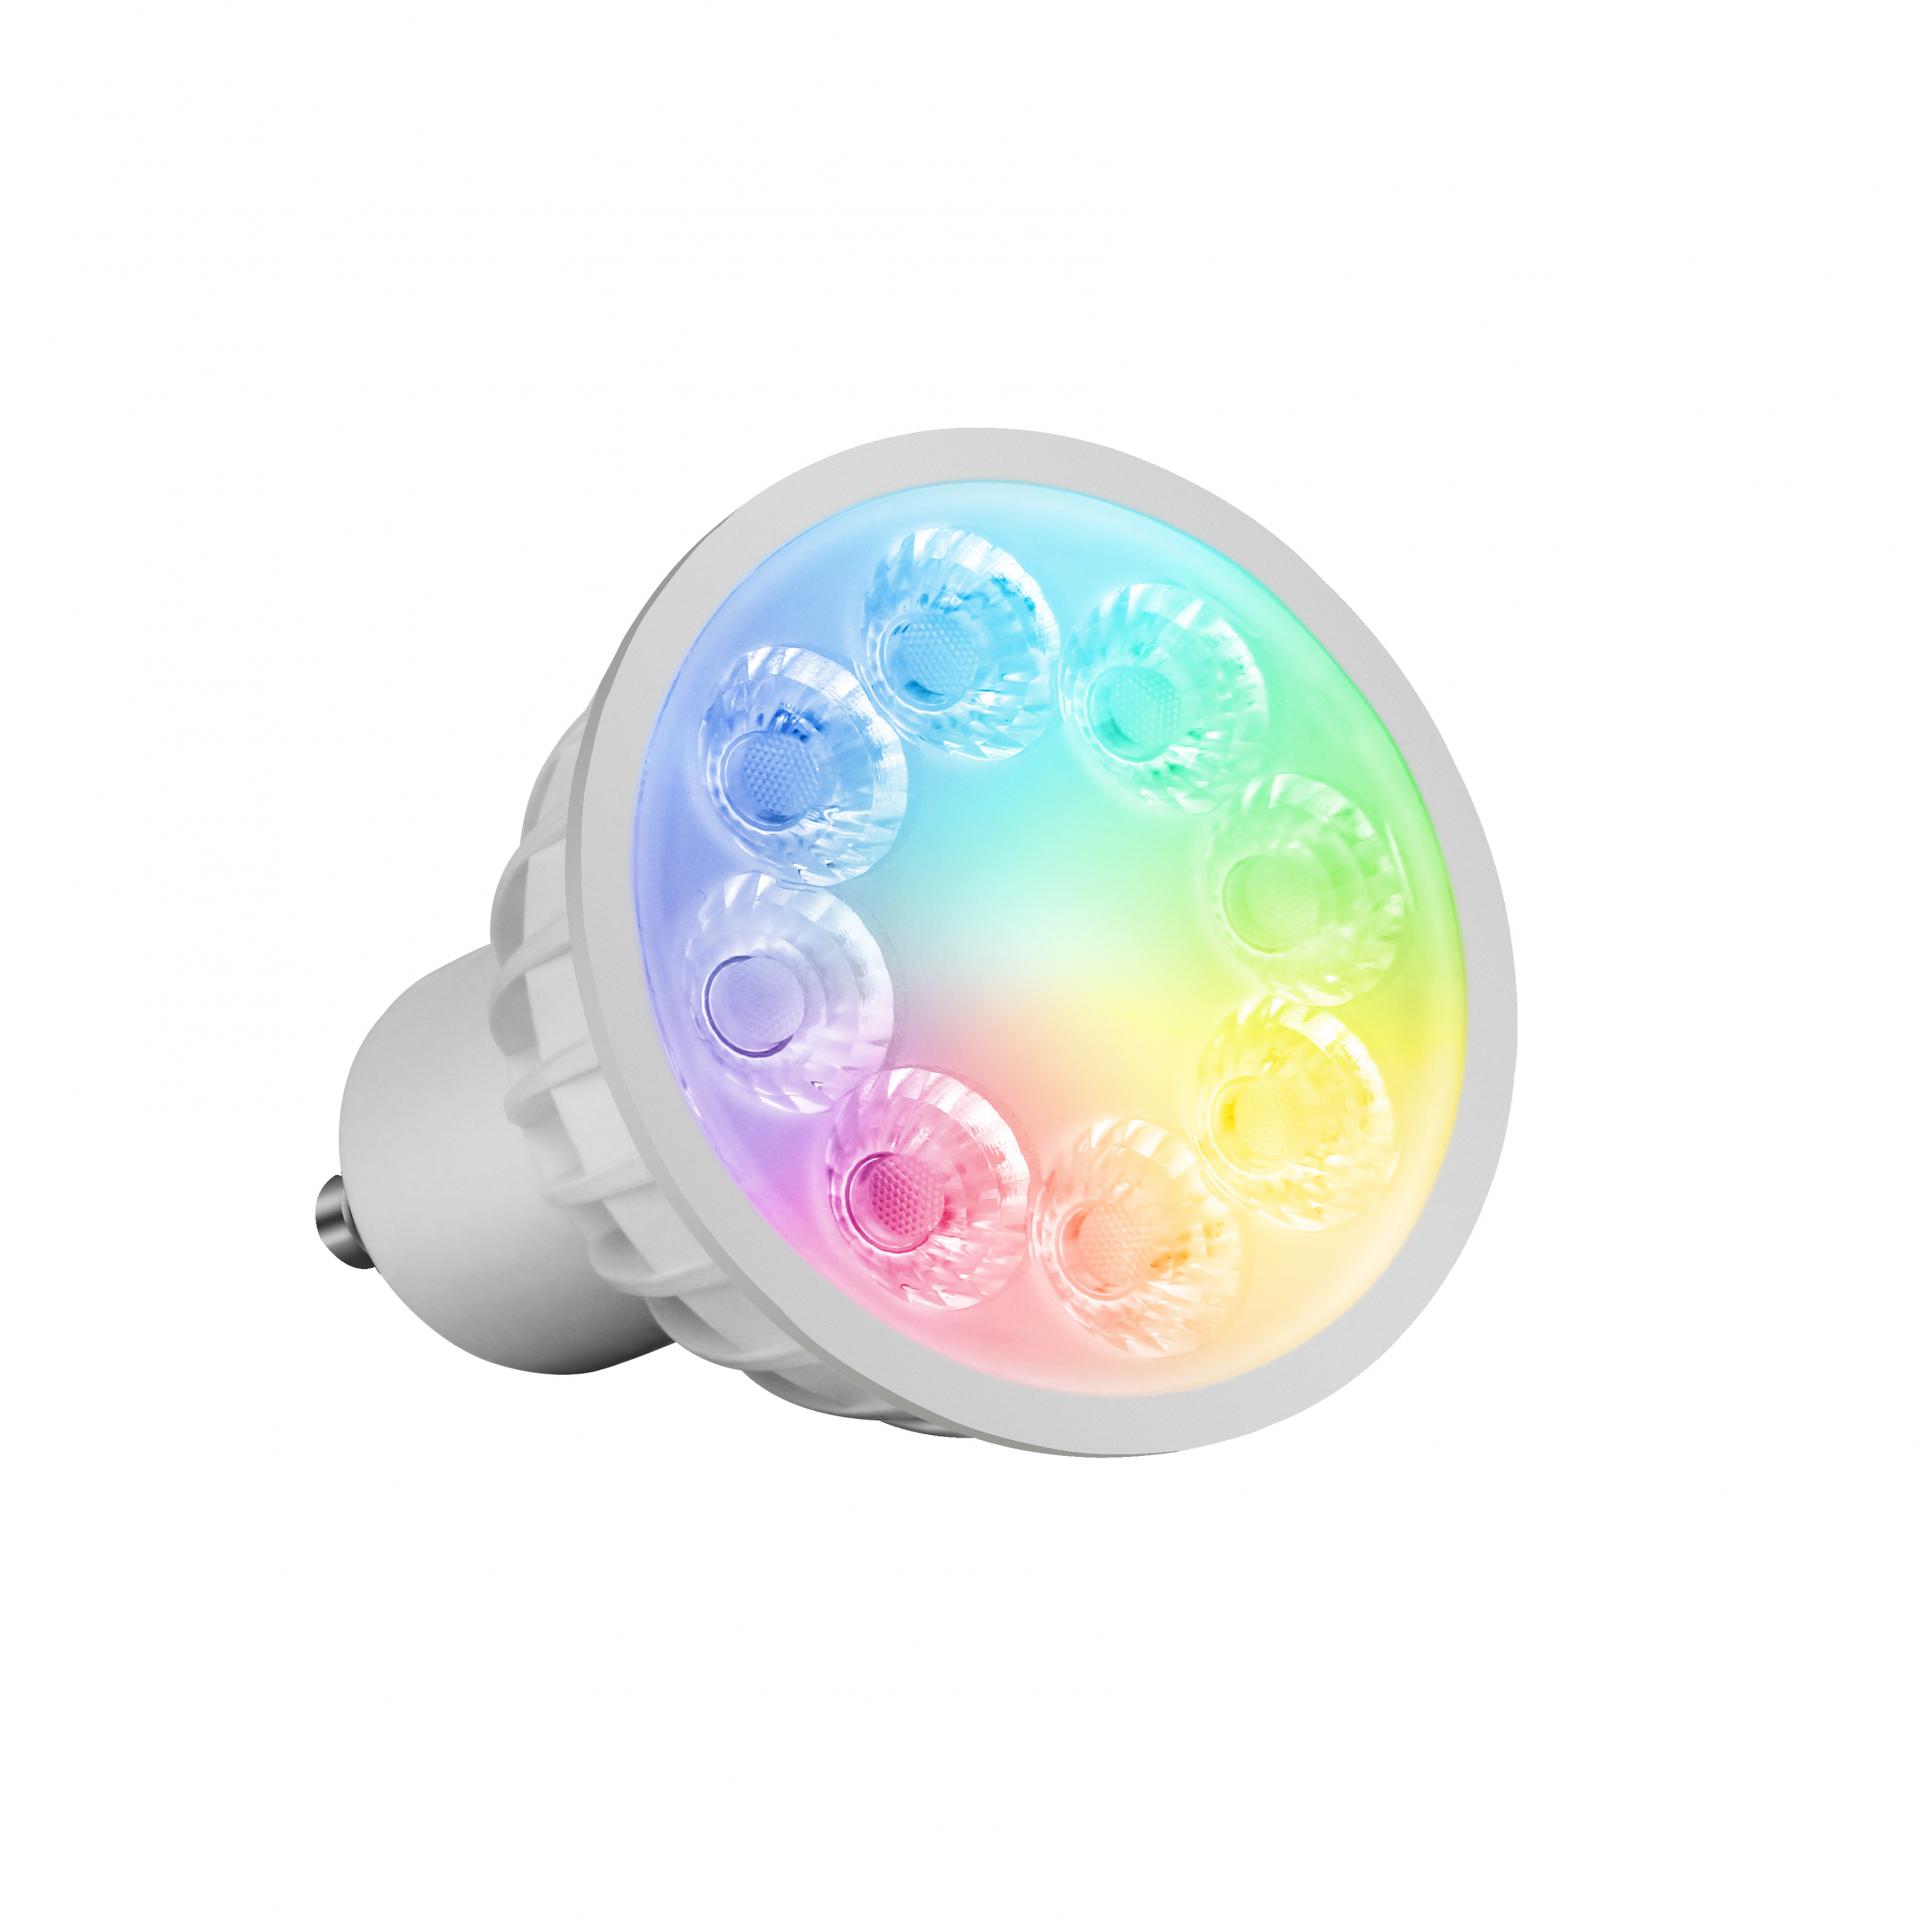 Mi-light slimme led verlichting